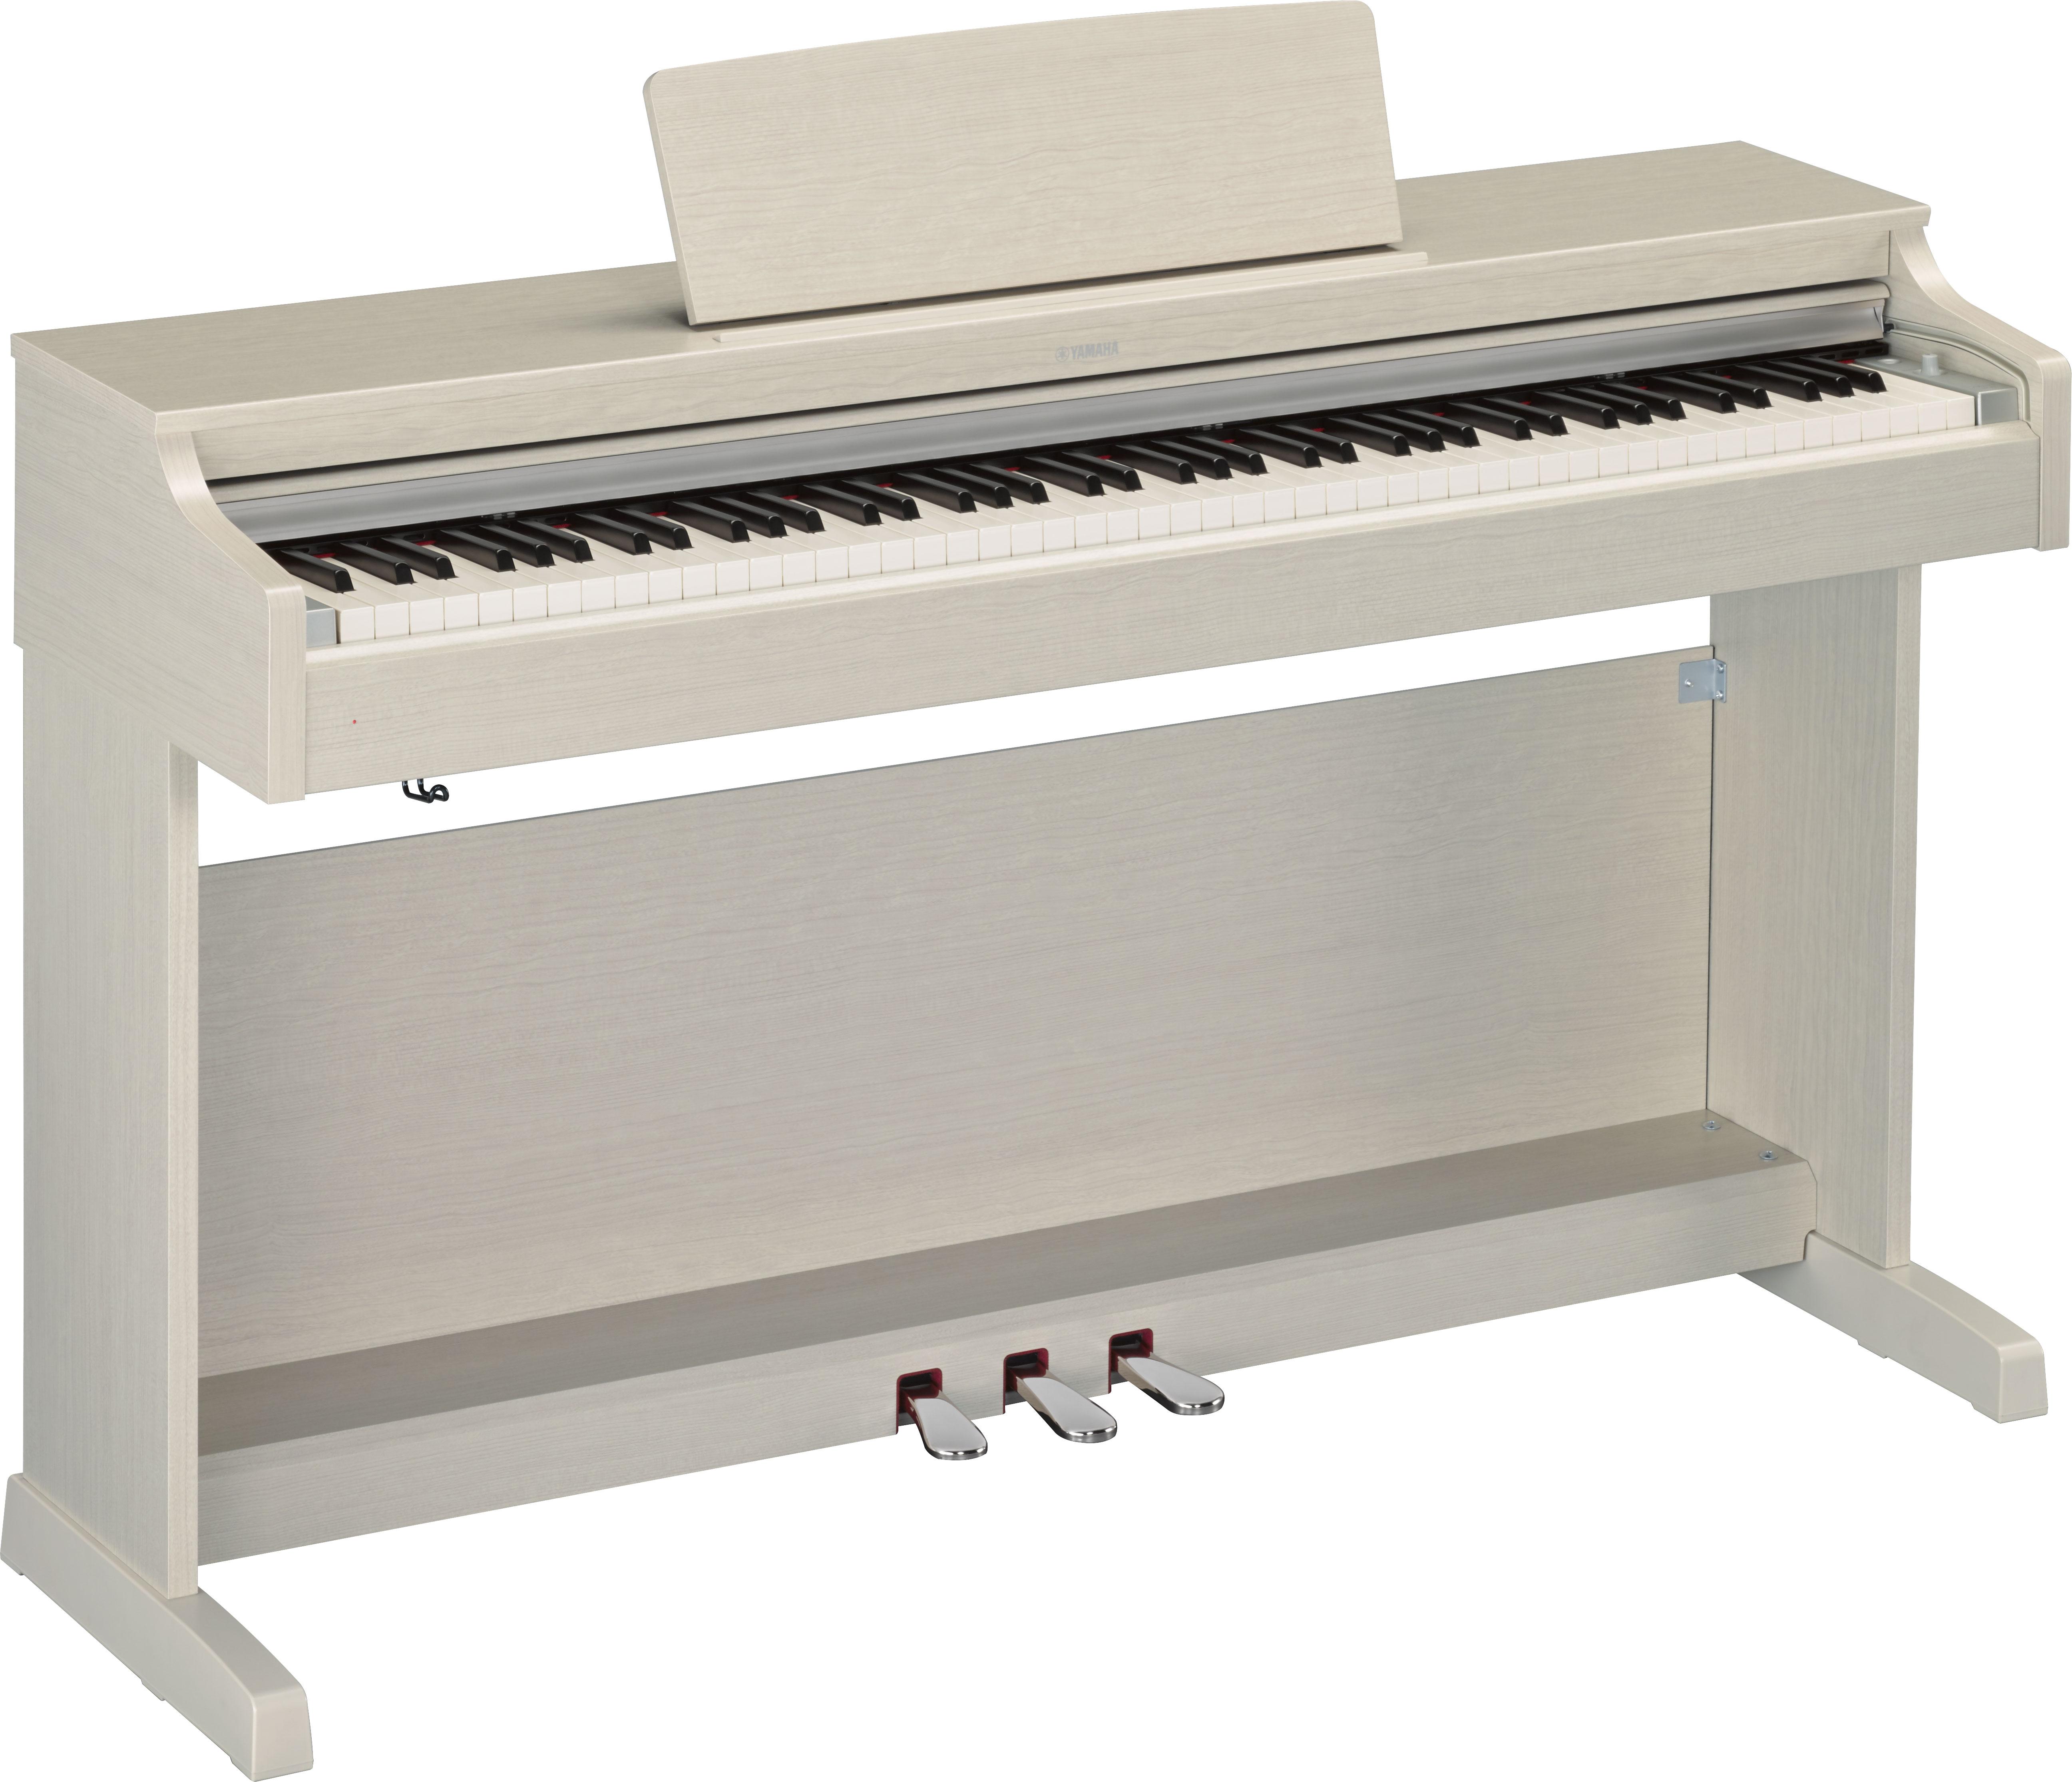 yamaha keyboard stand assembly instructions